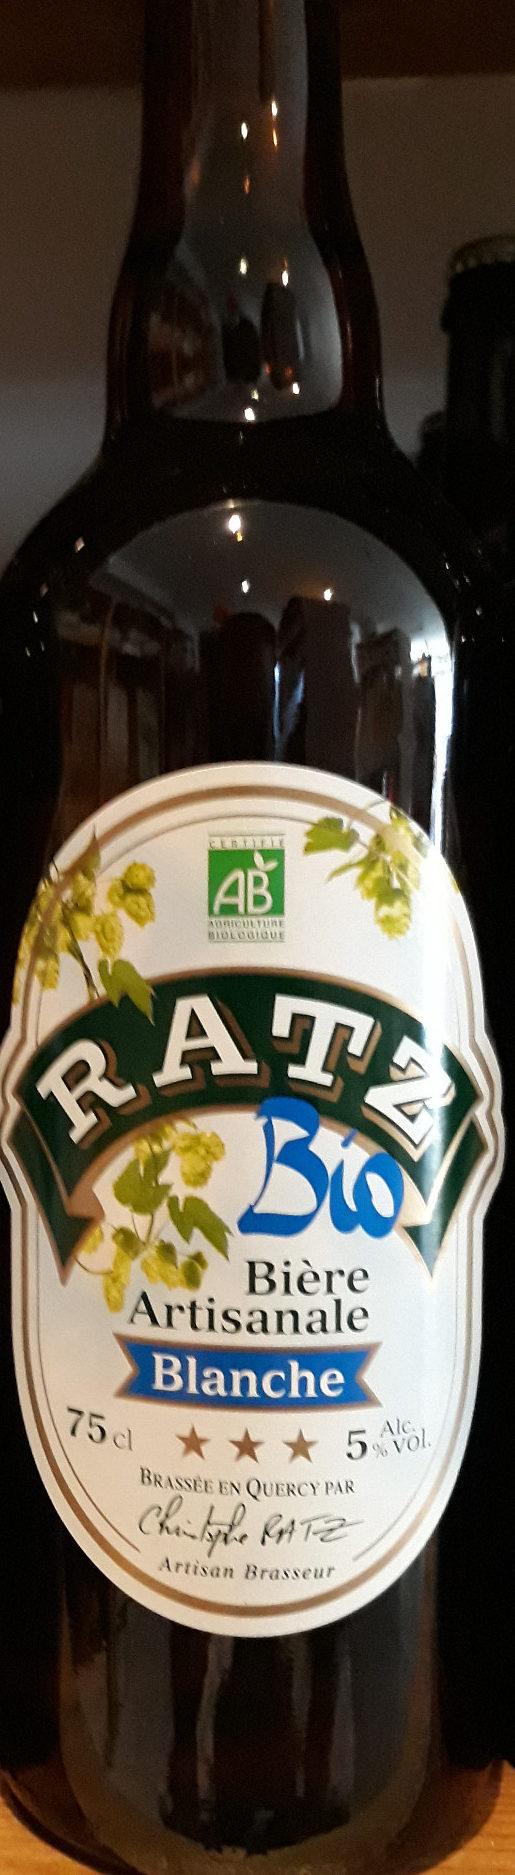 Biere Blanche Artisanale Bio - Product - fr